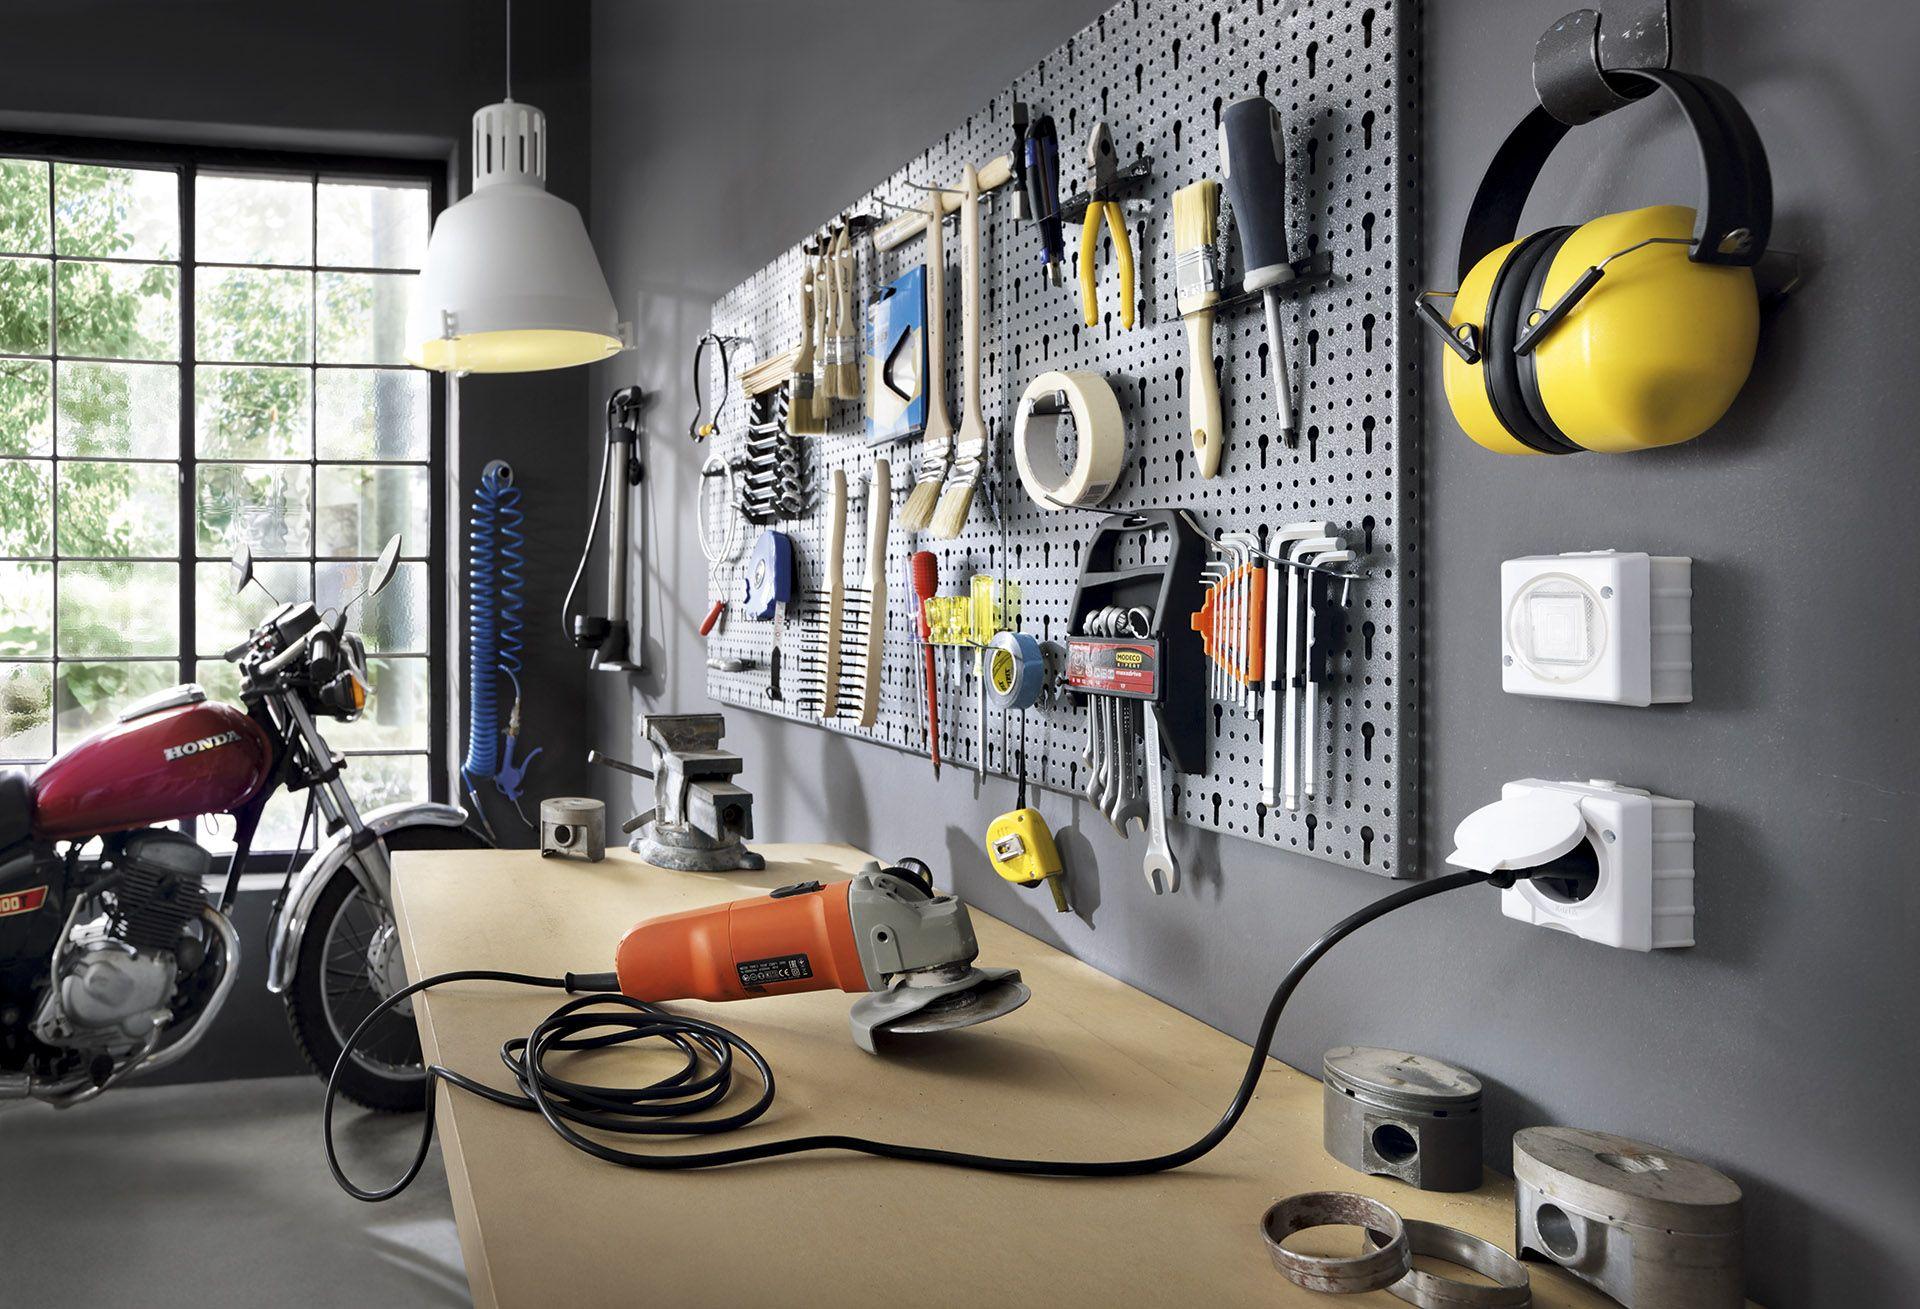 Linia Senior Najlepsza Do Warsztatu Senior Line Best For A Workshop Home Appliances Electrical Supplies Home